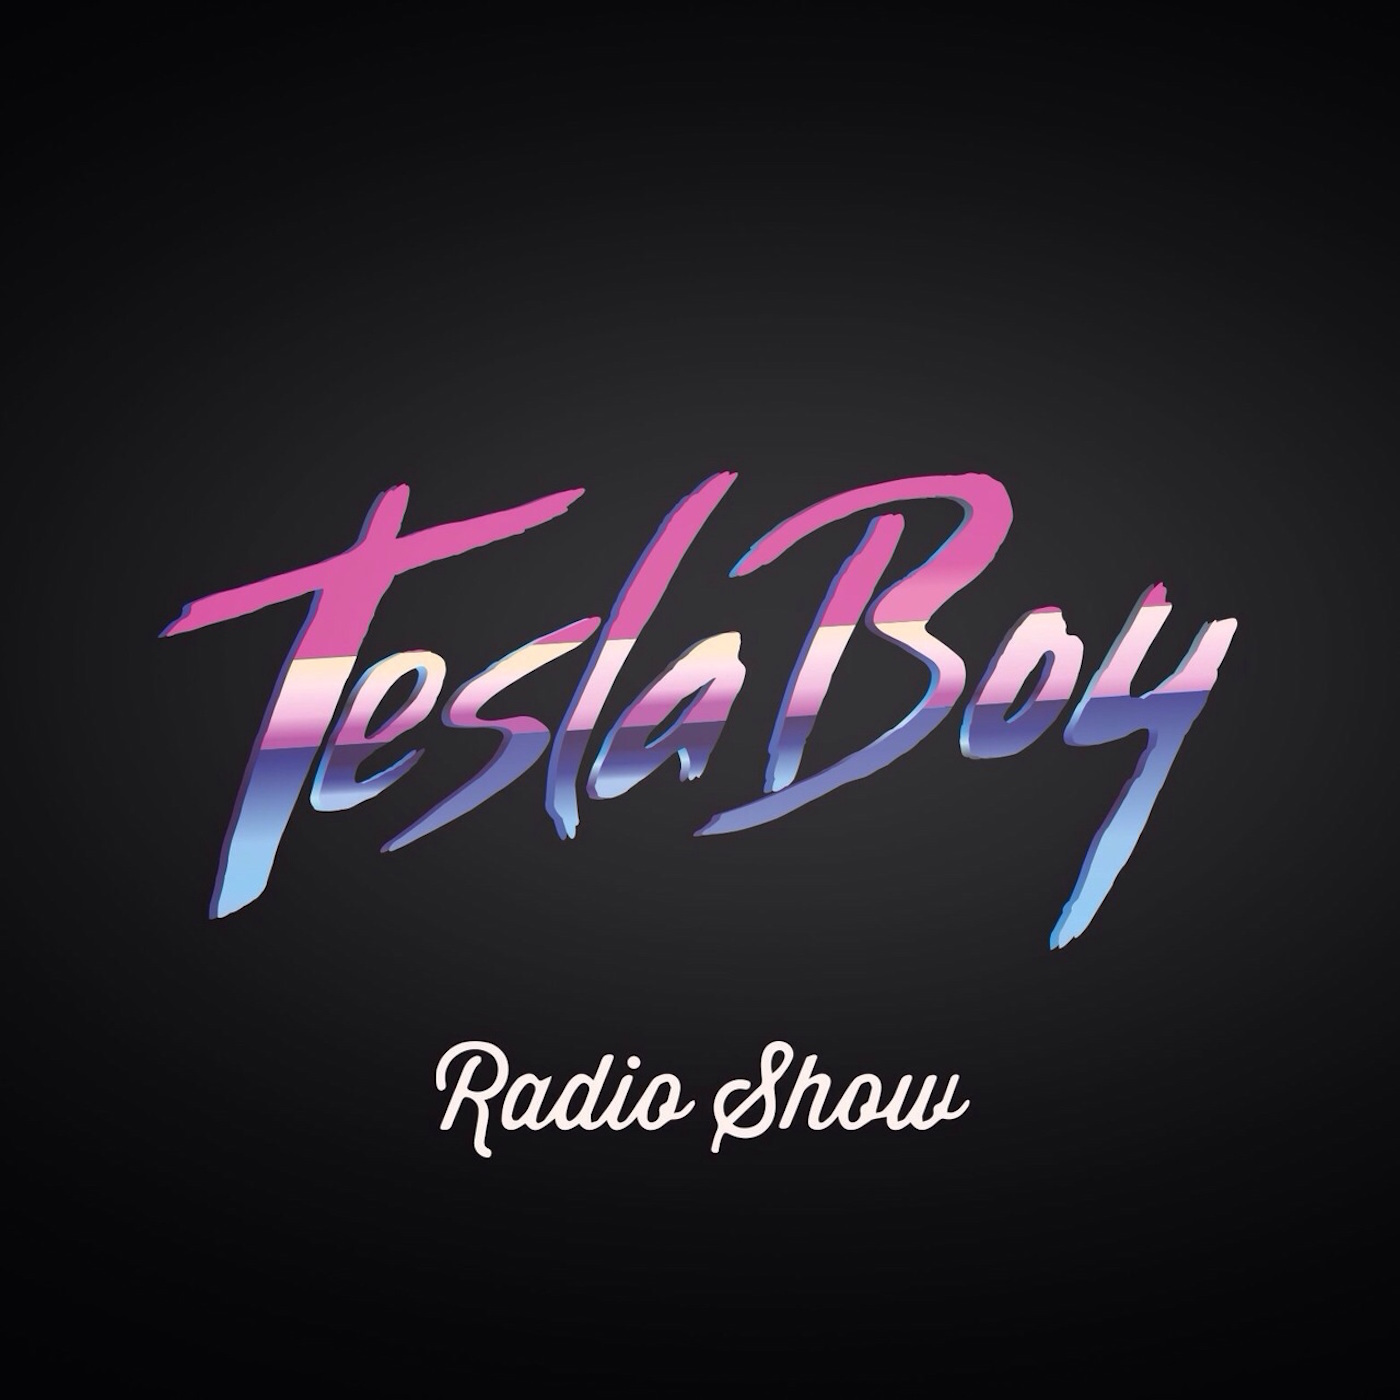 Tesla Boy Radio Show